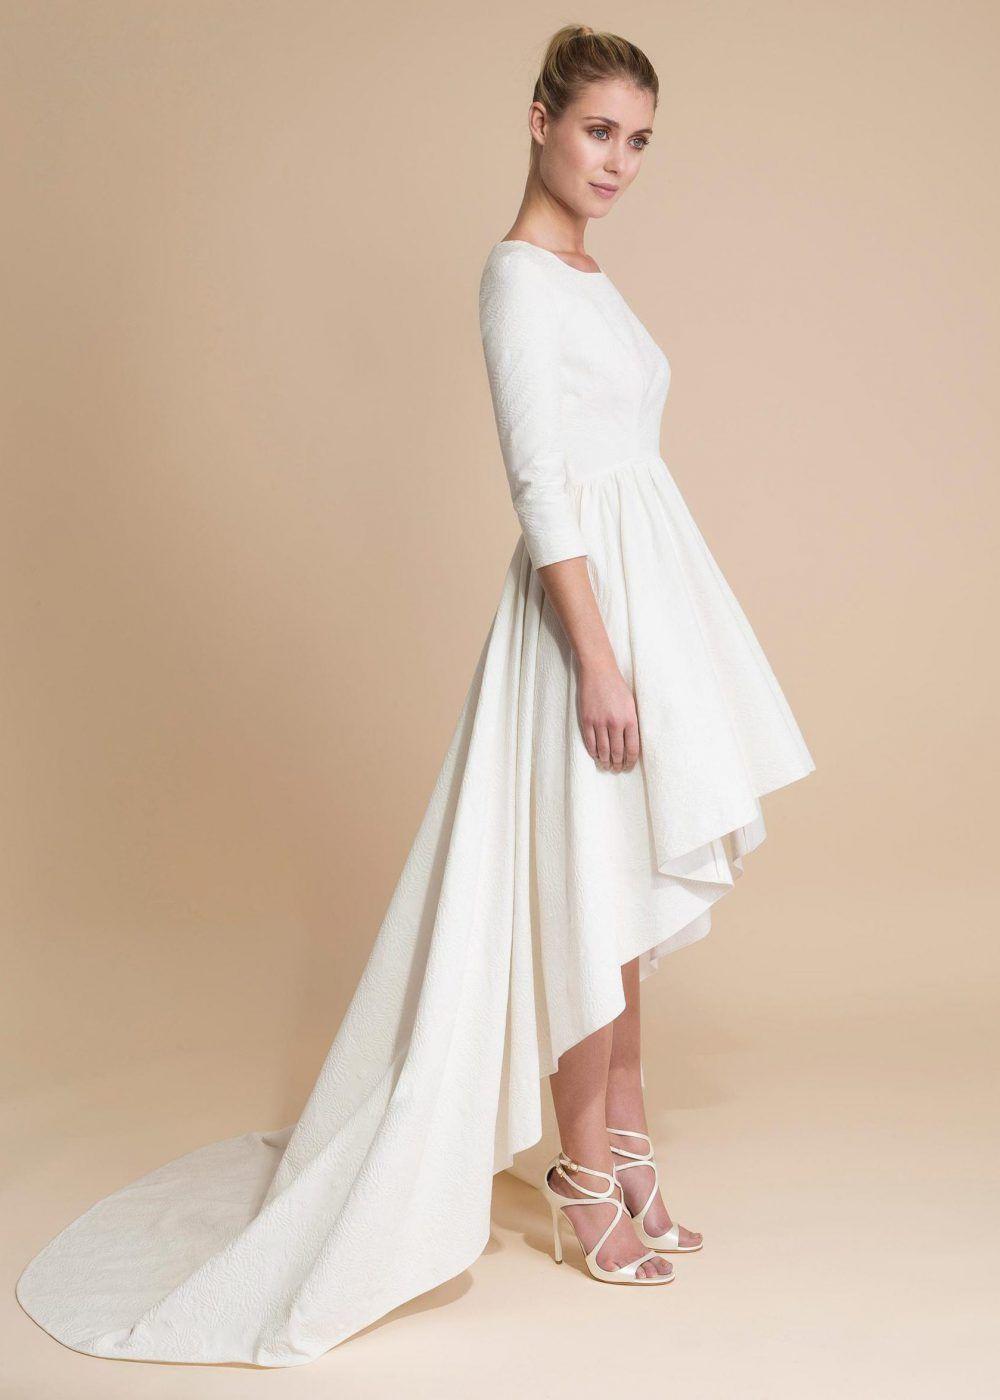 Robe de mariée courte avec traine.   Weddıng 9ca0260db032